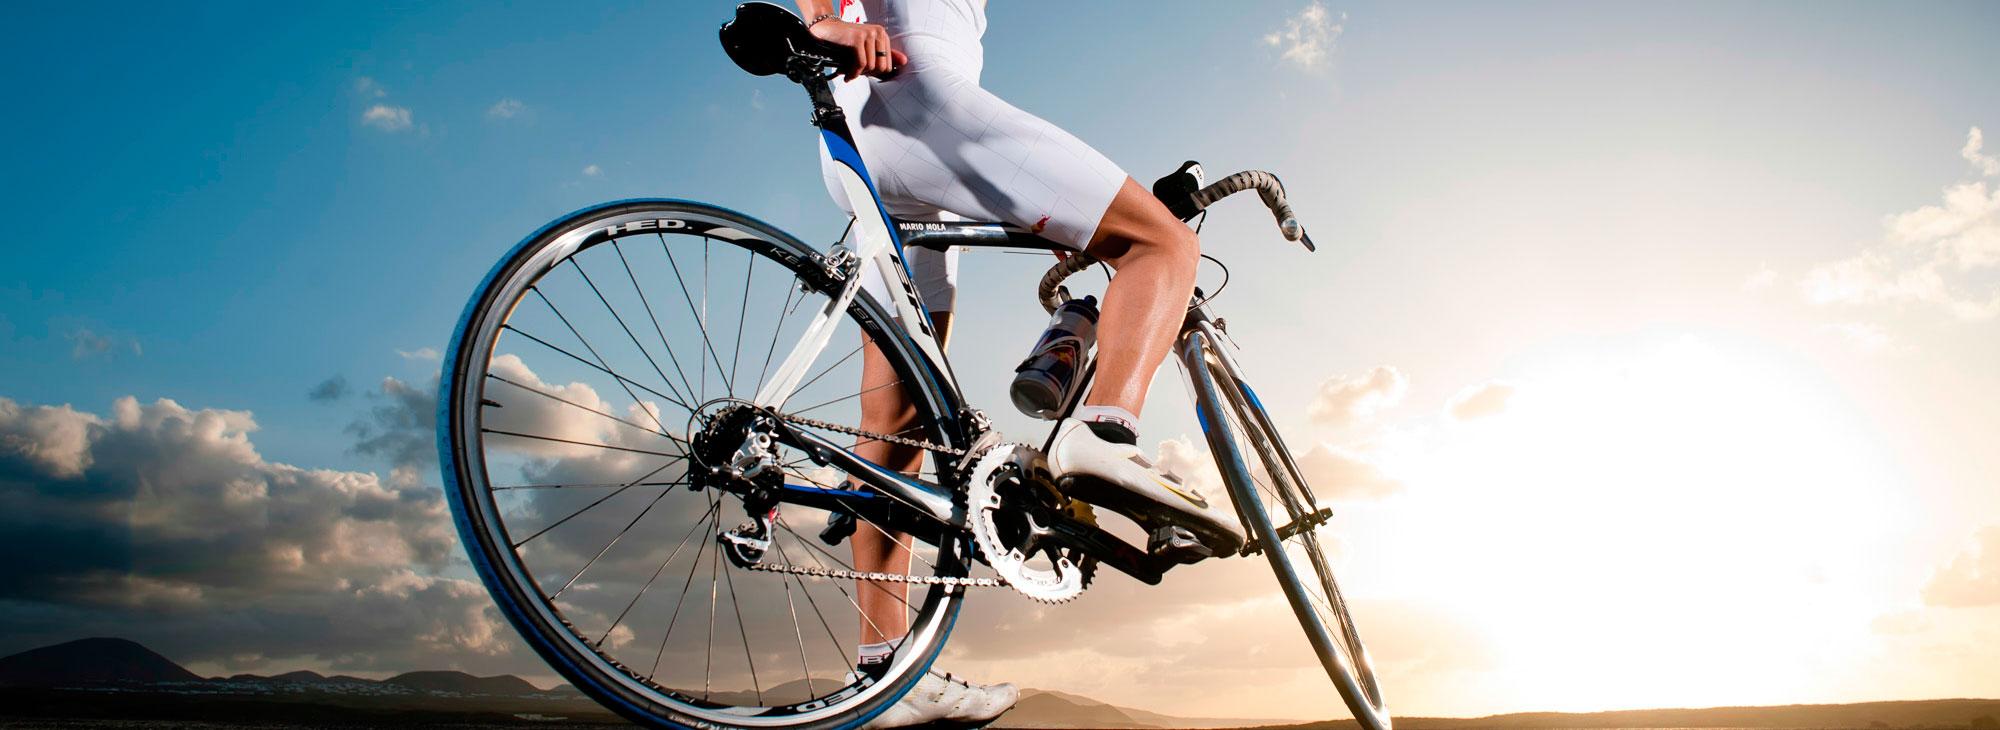 sistime-capa-copa-ciclismo-fernando-bikes-2016